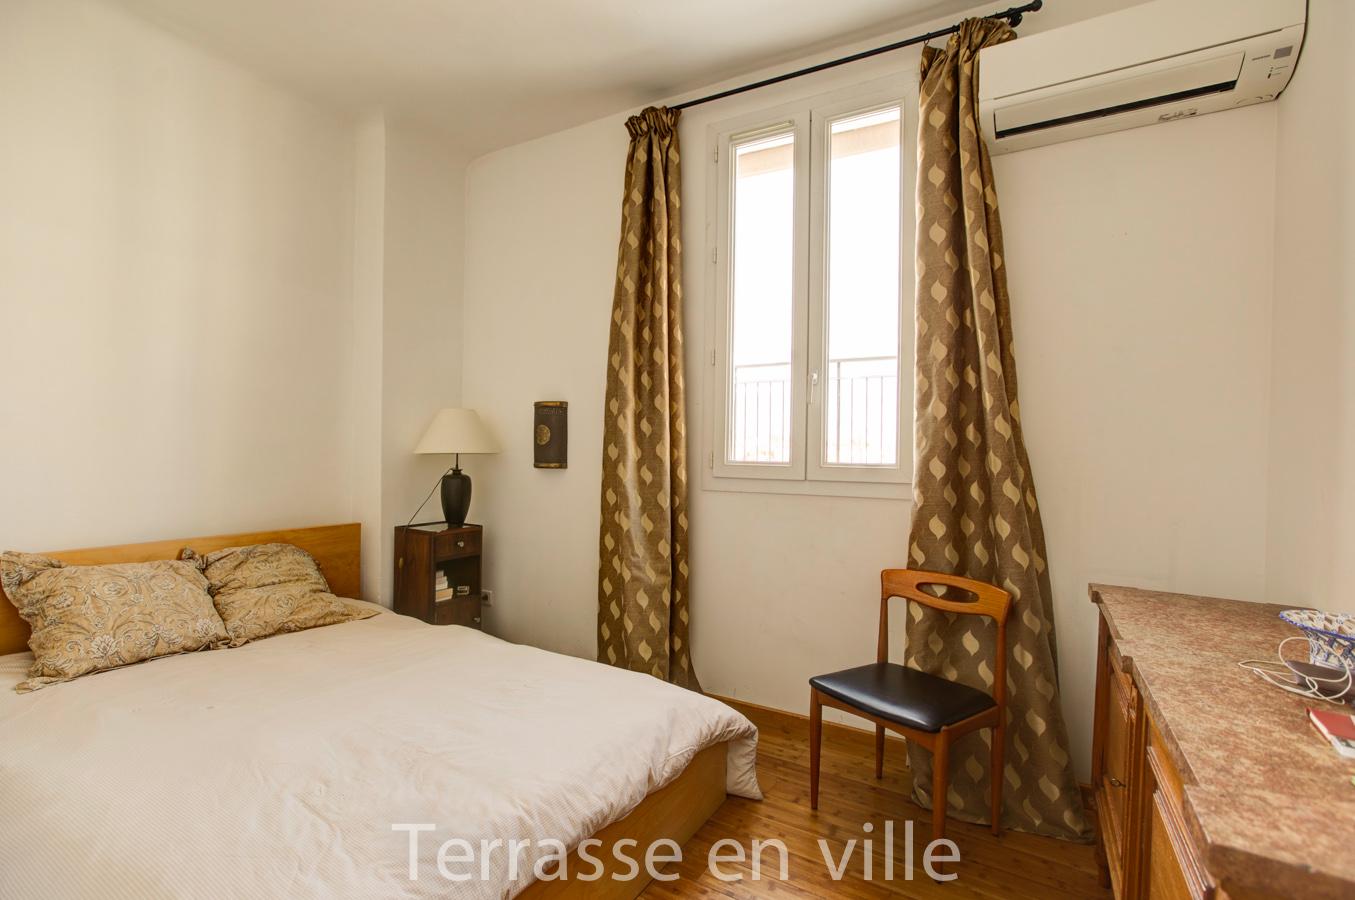 terrasse-10-1.jpg